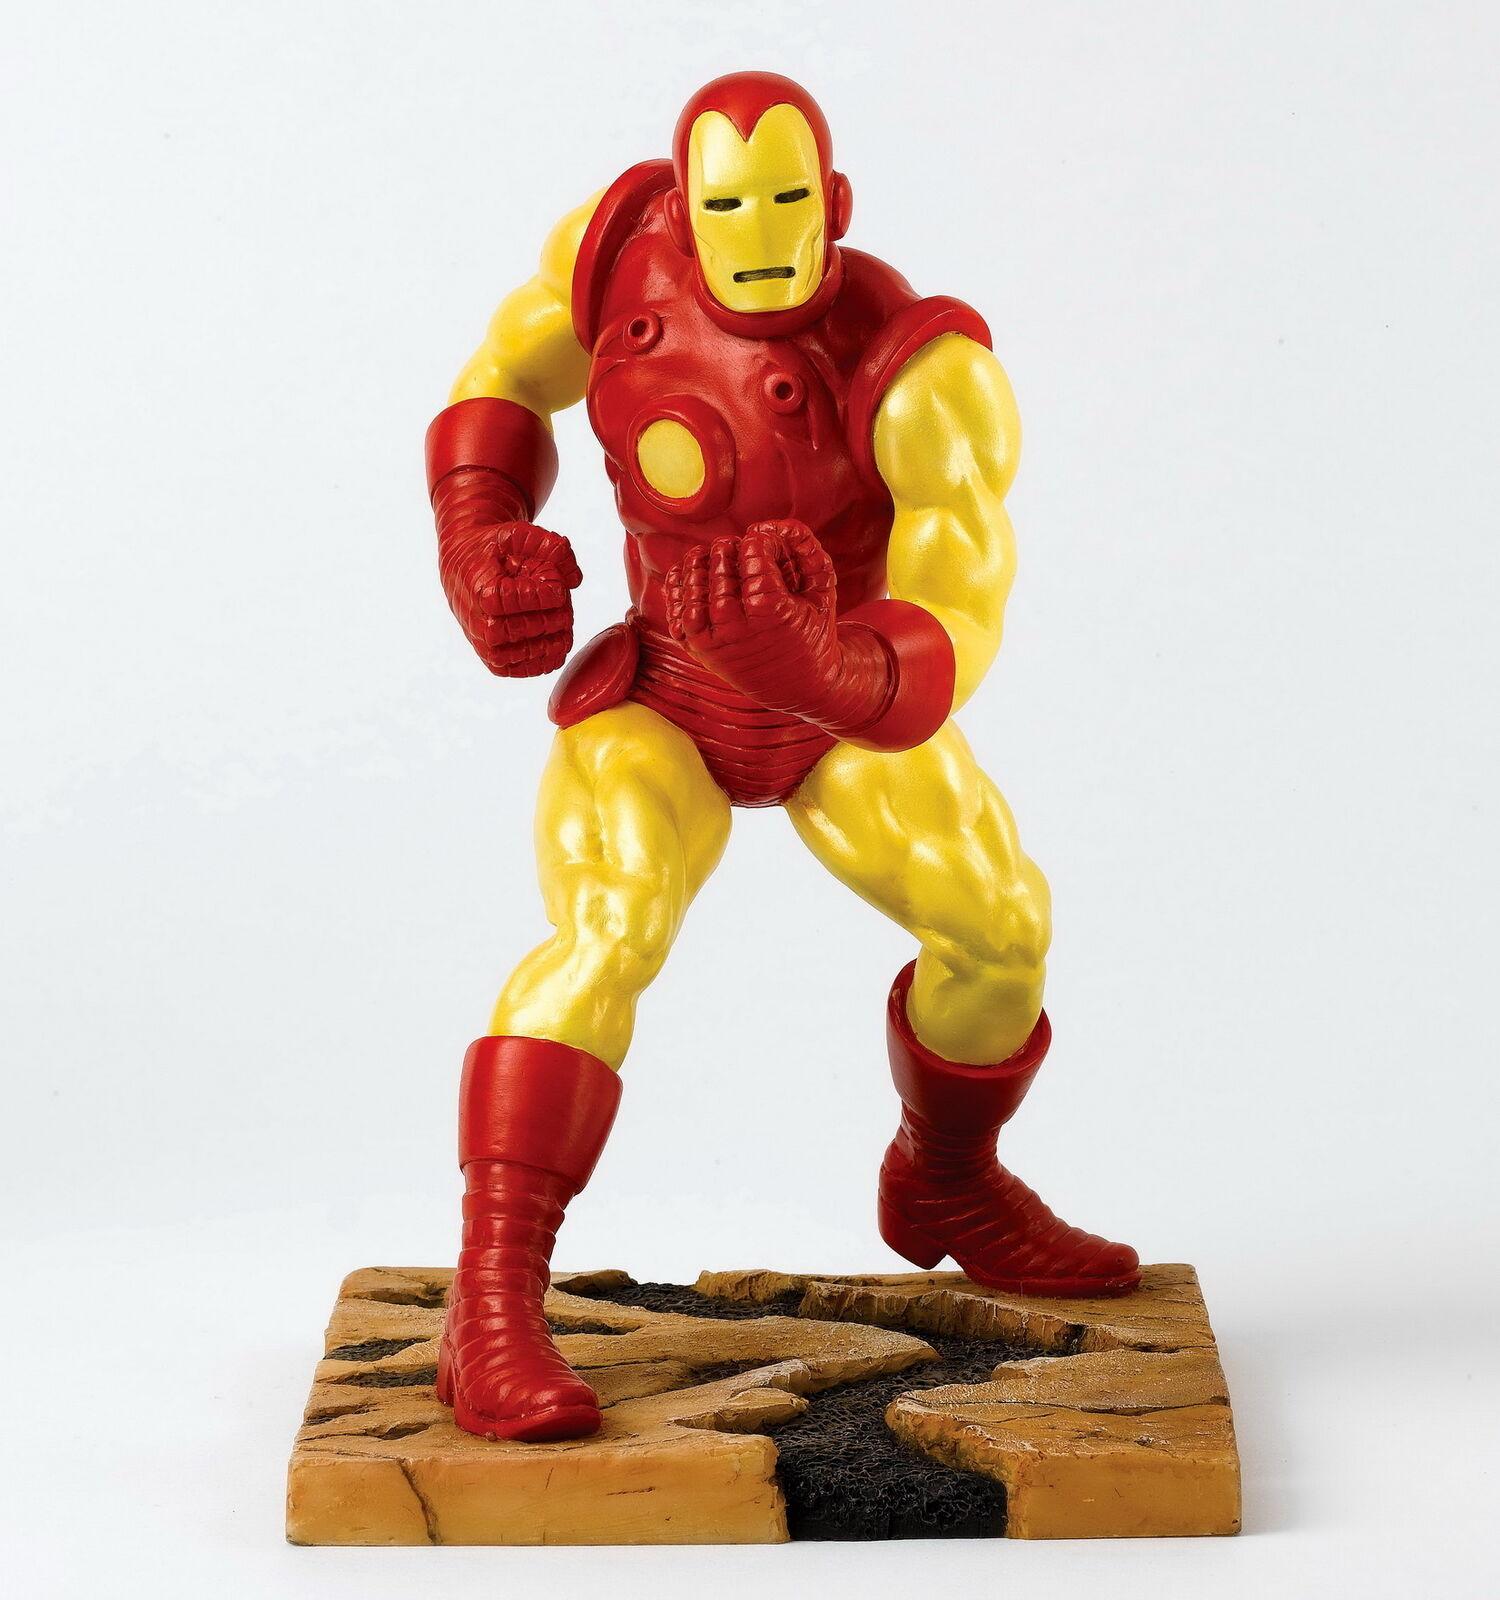 Marvel Enesco Super Héros Sculpture -   Iron Man   - A27598 - 15 X 15.5 X 21 Cm